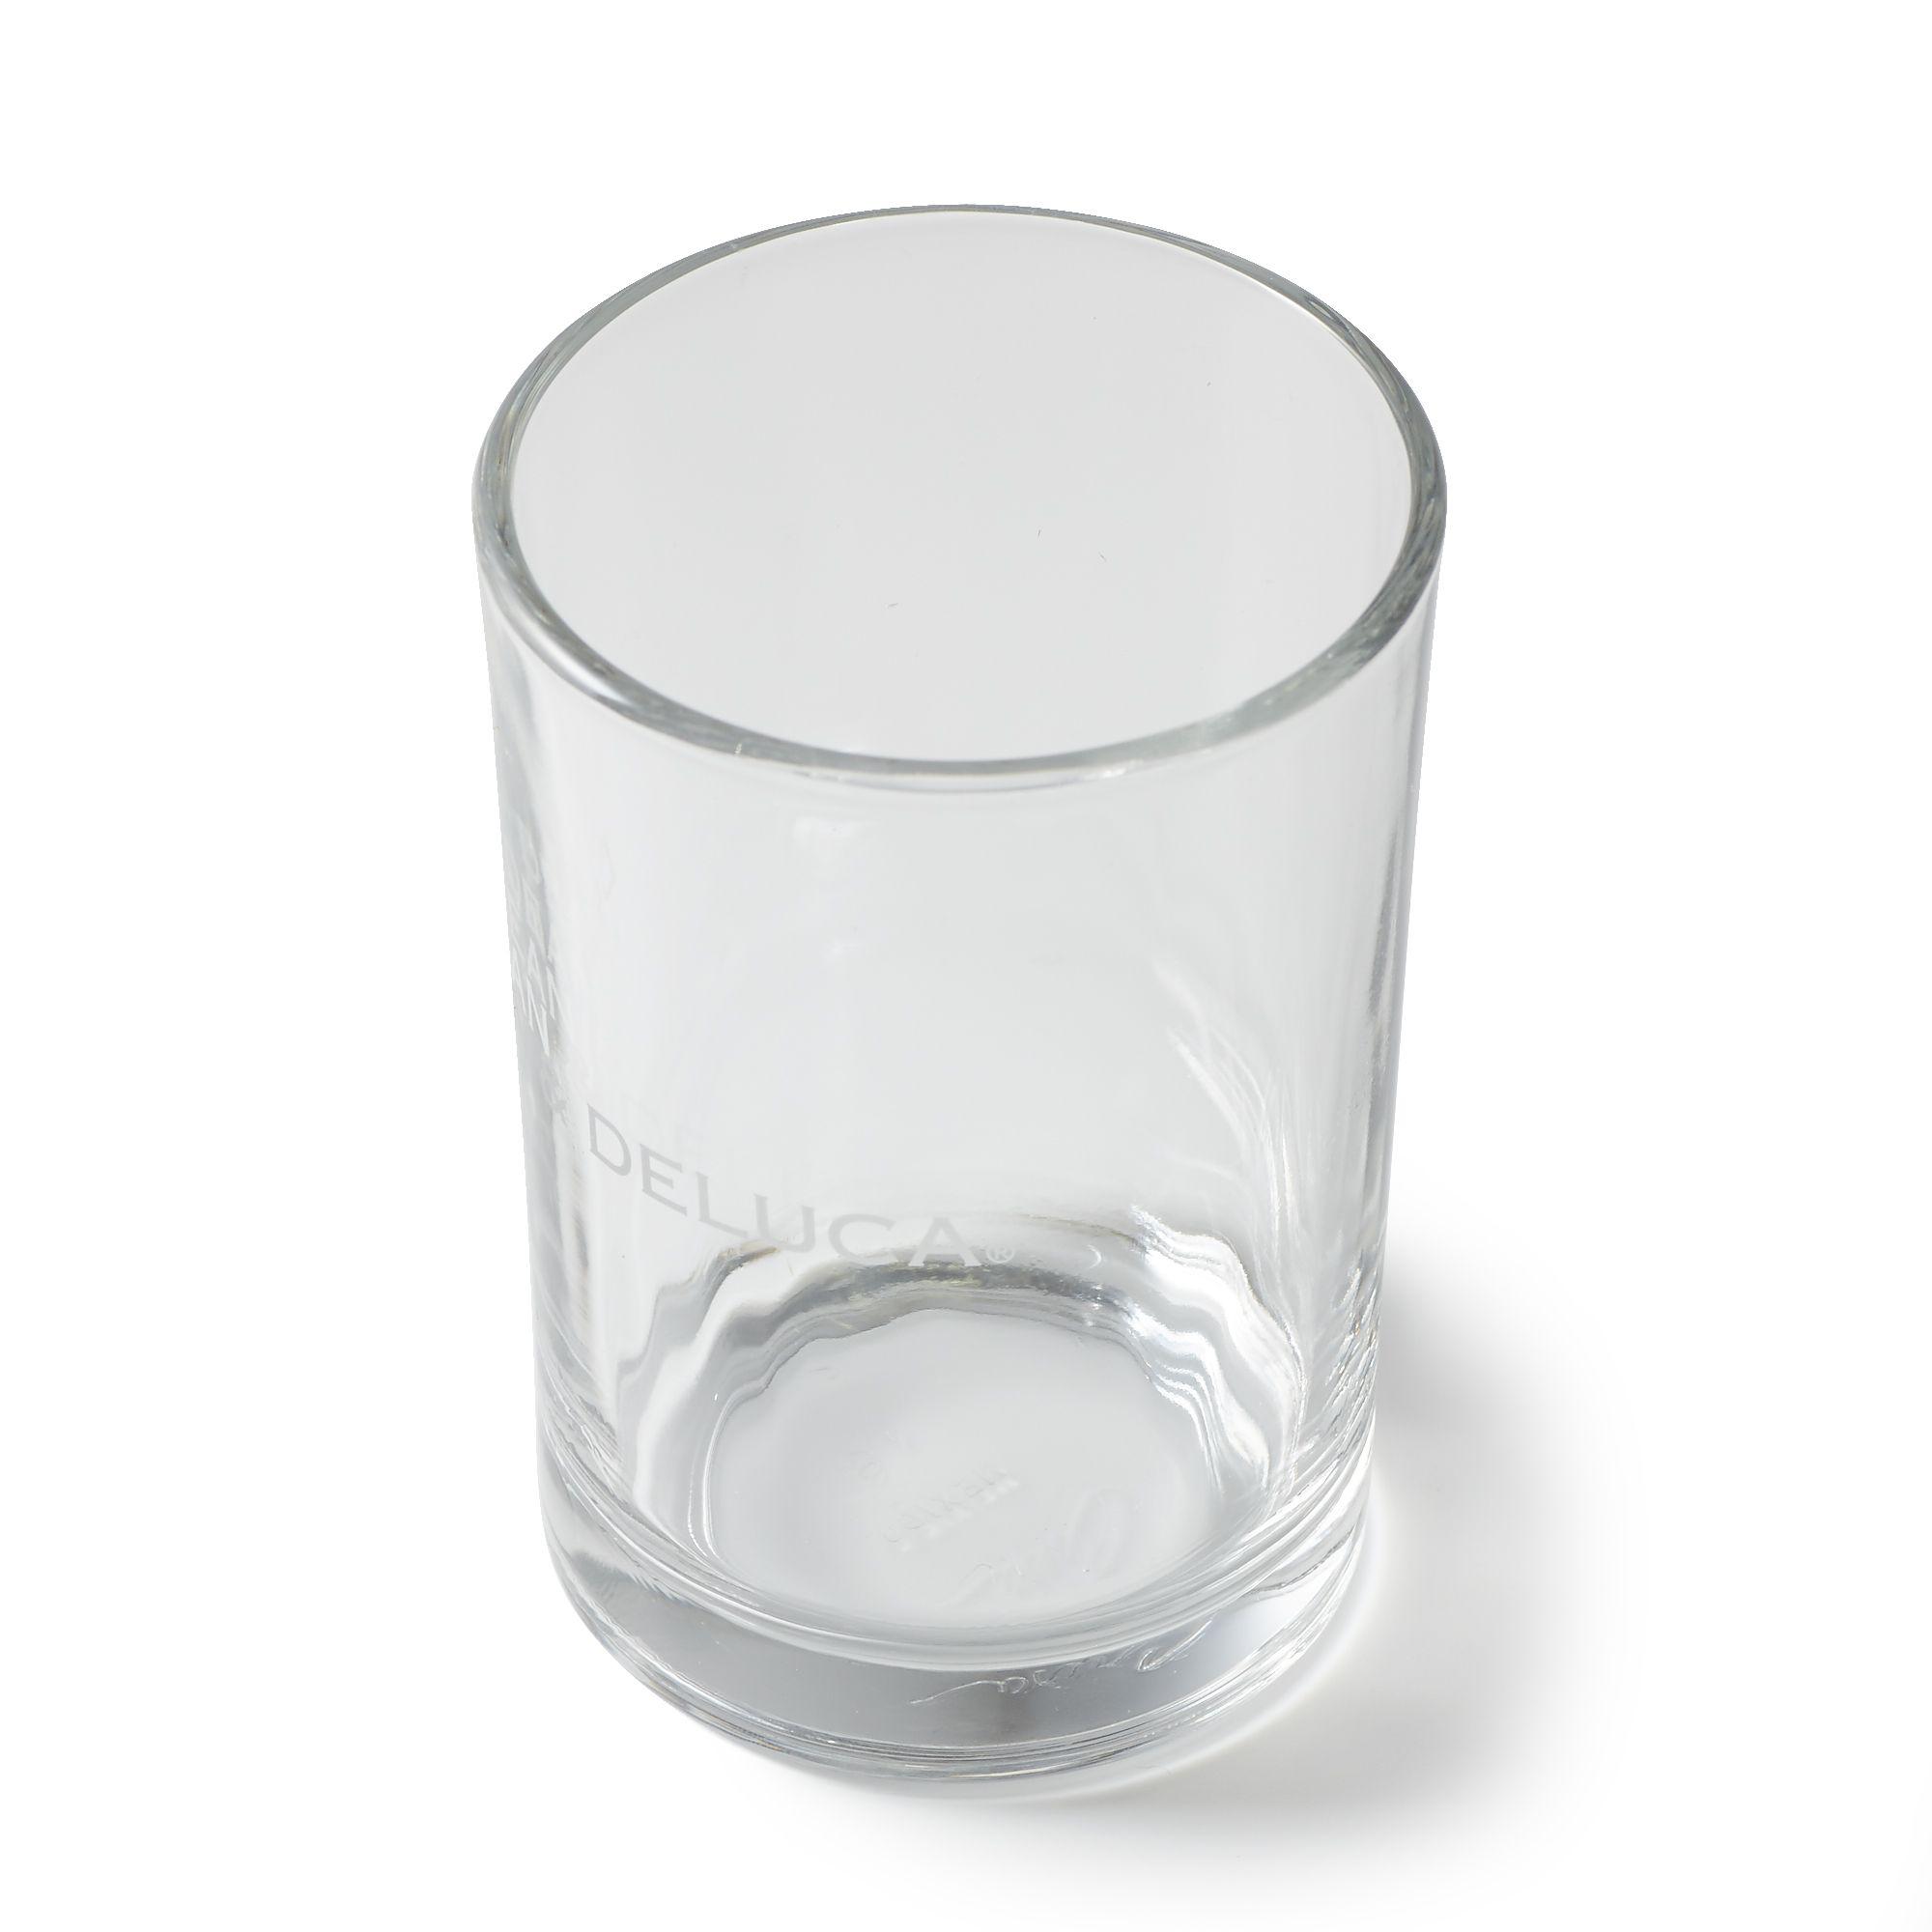 DEAN & DELUCA グラスS